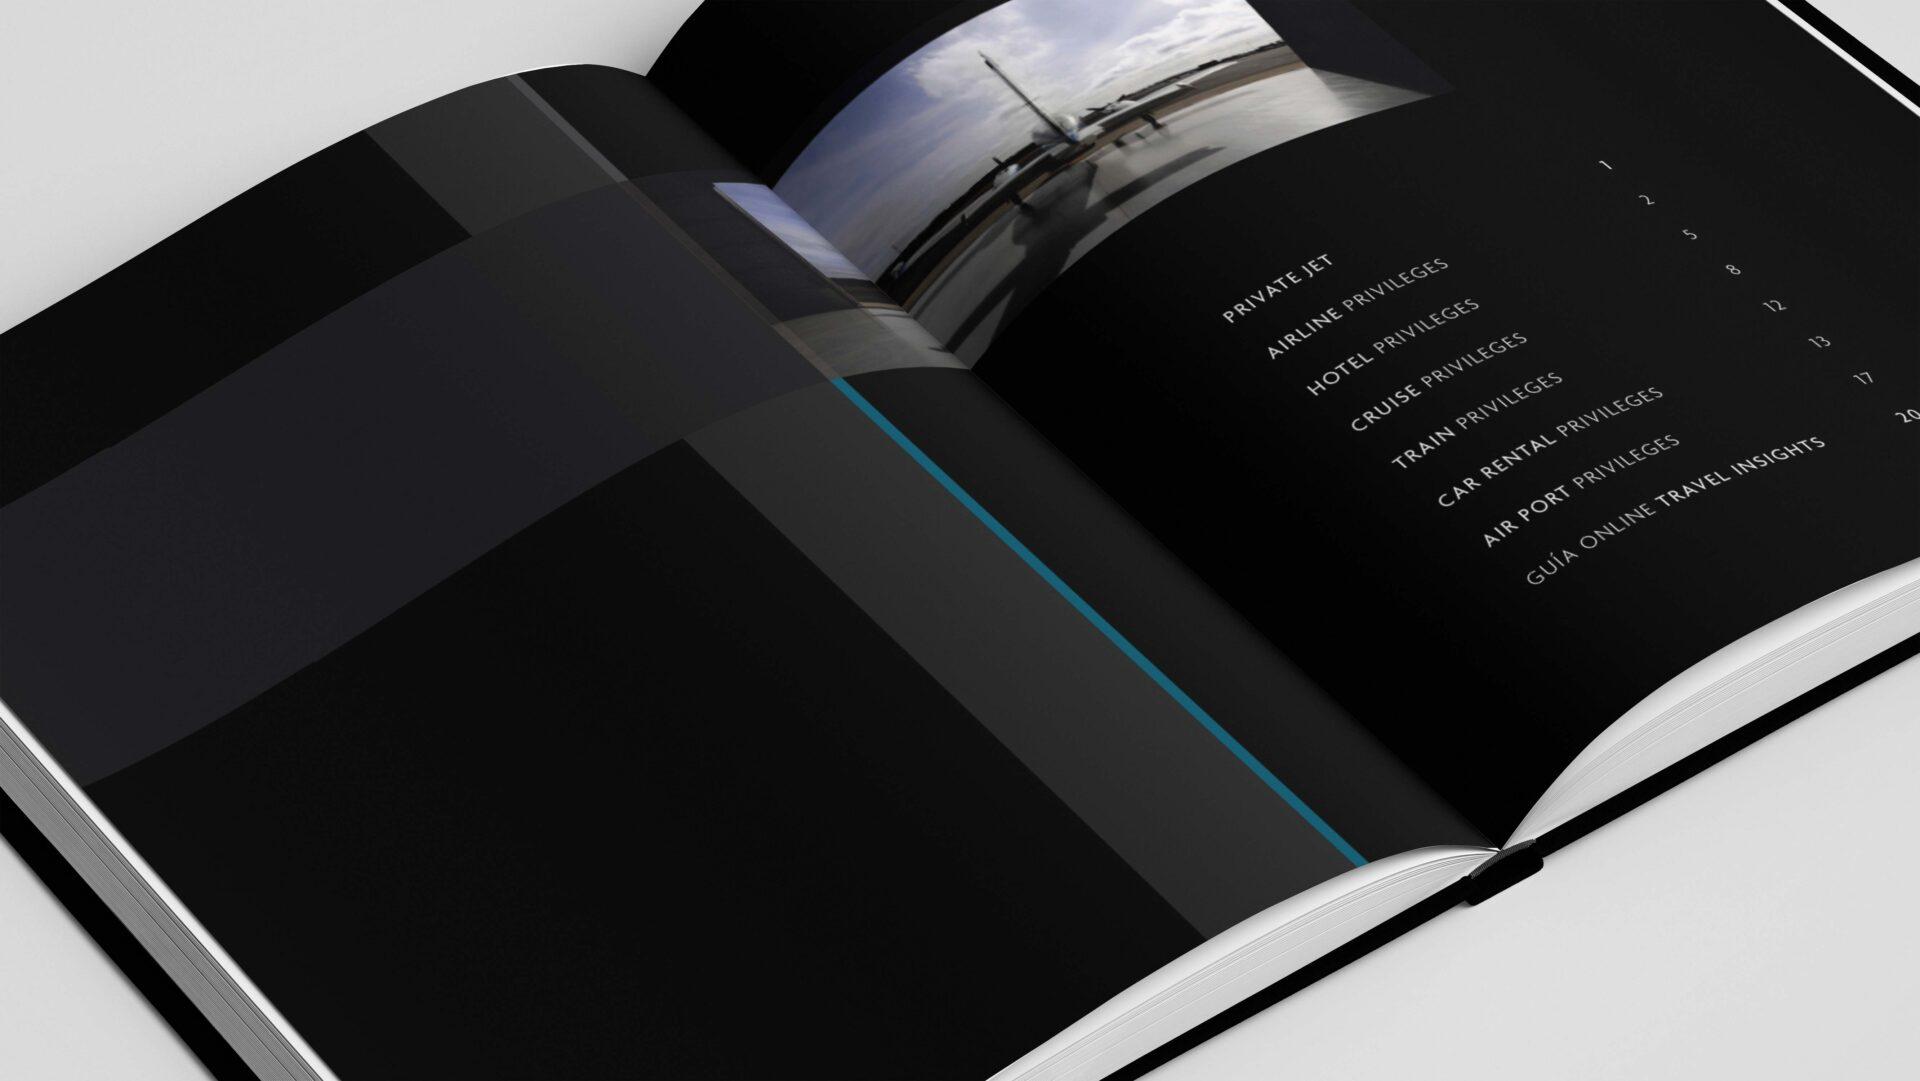 03_amex-centurion_black_book